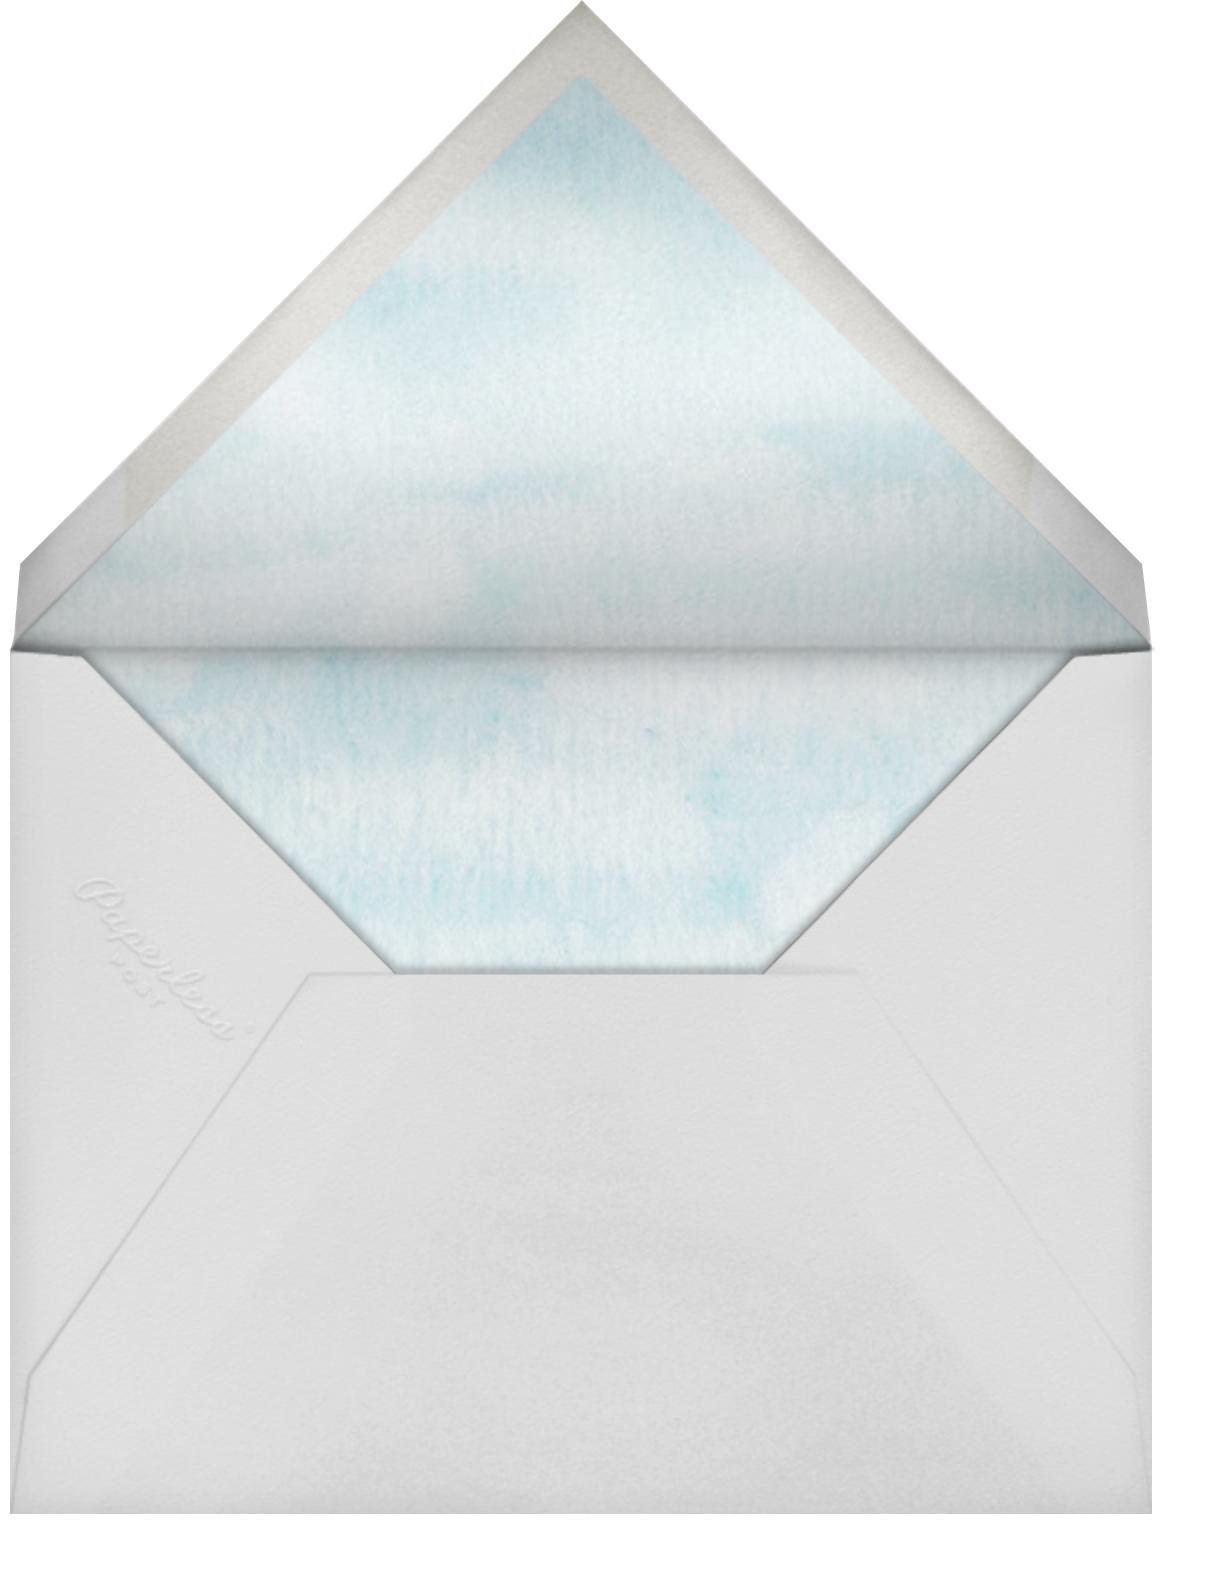 Montparnasse (Stationery) - Paperless Post - Notecards - envelope back